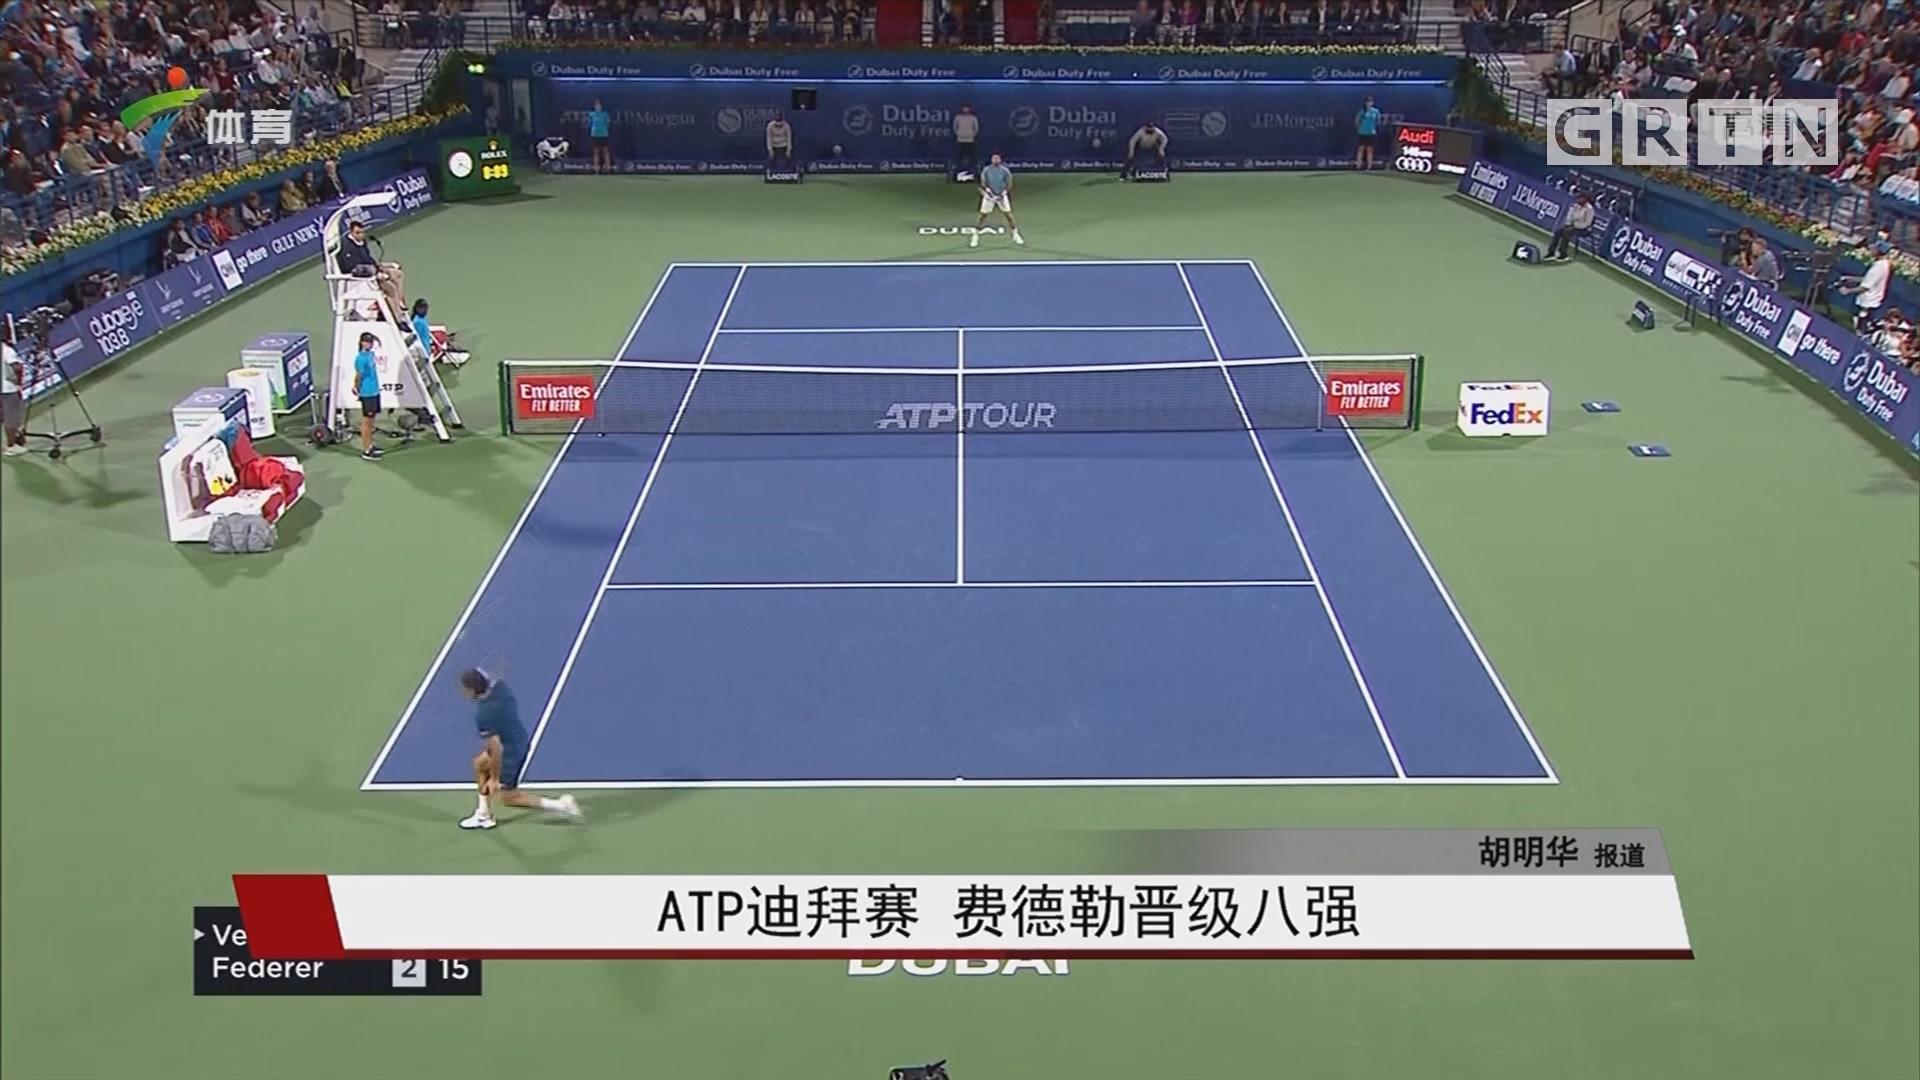 ATP迪拜赛 费德勒晋级八强